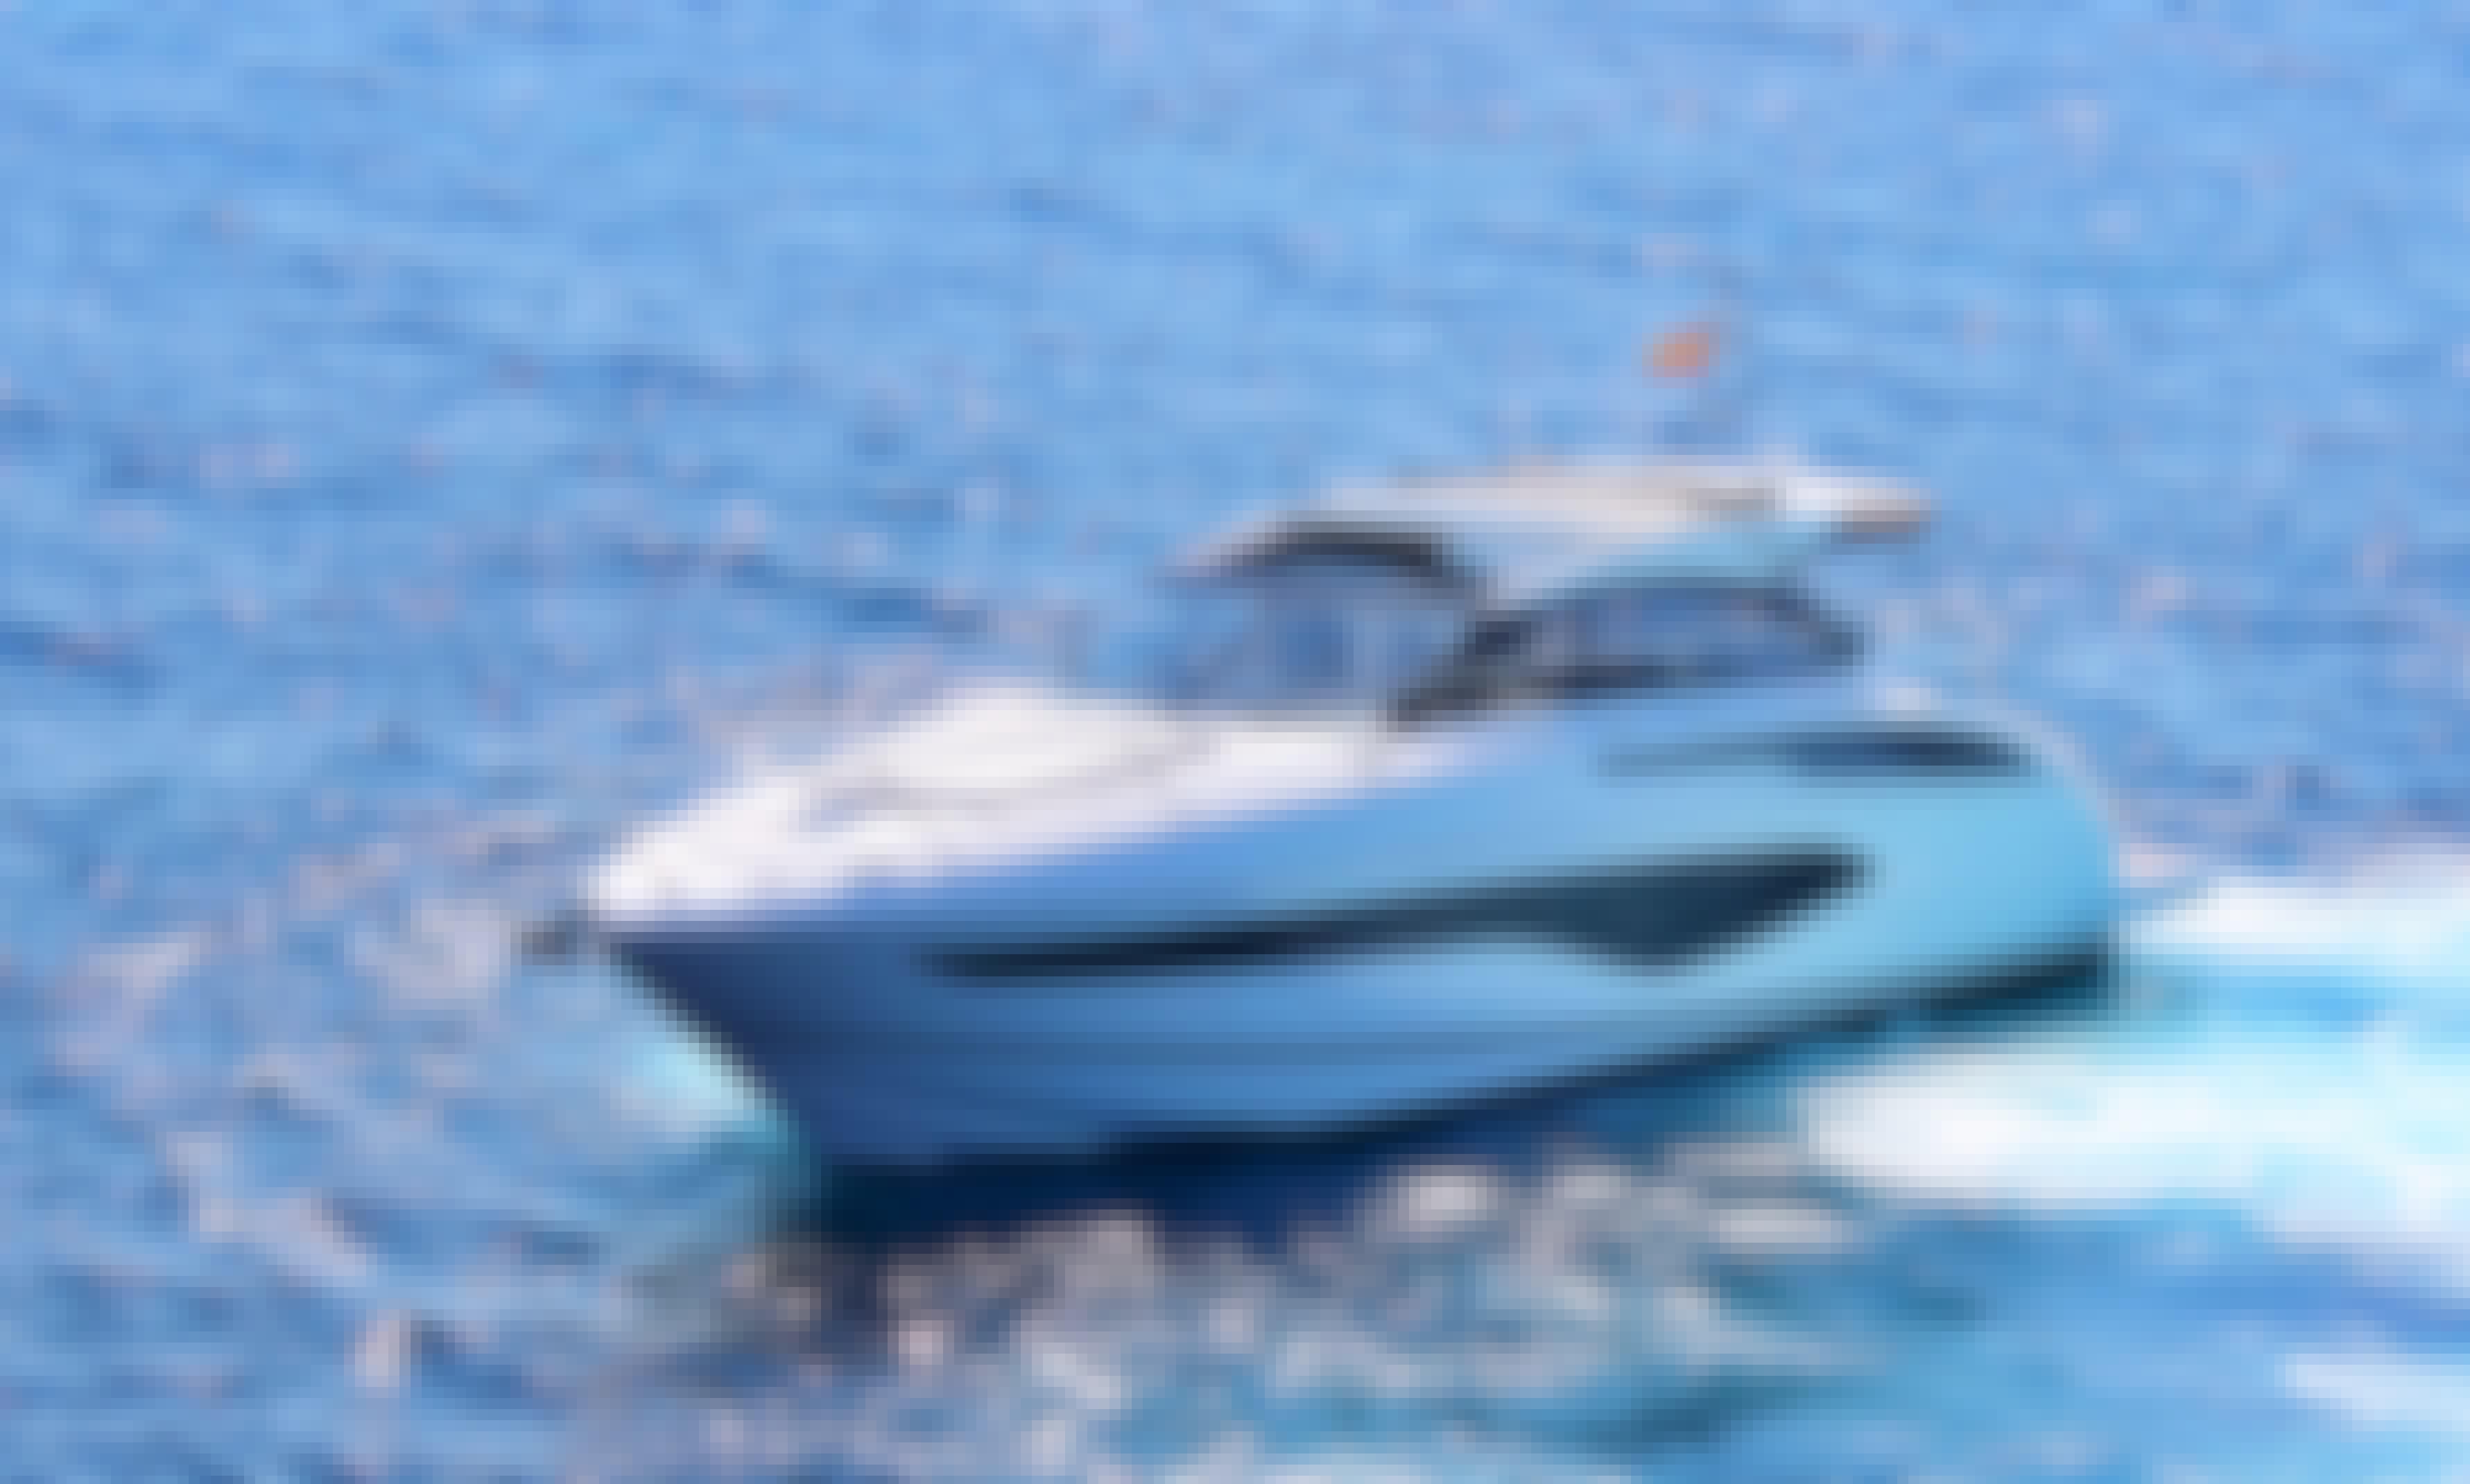 Princess v50 Motor Yacht Rental in Ibiza, Spain